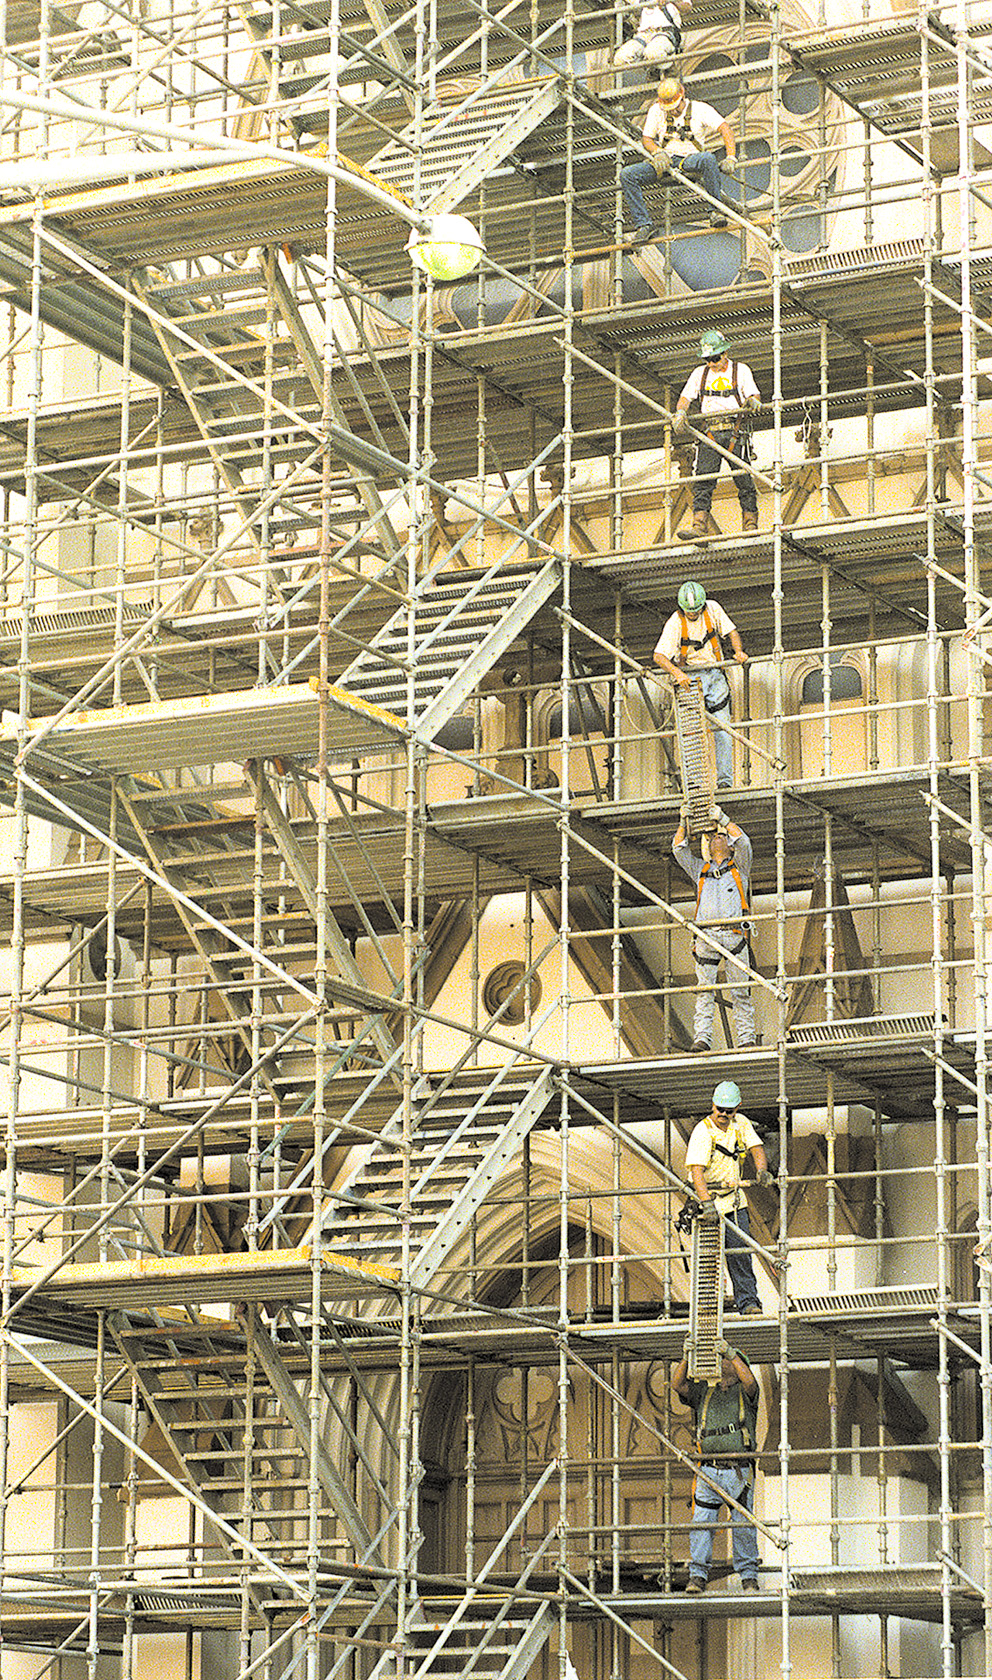 CSJB construction